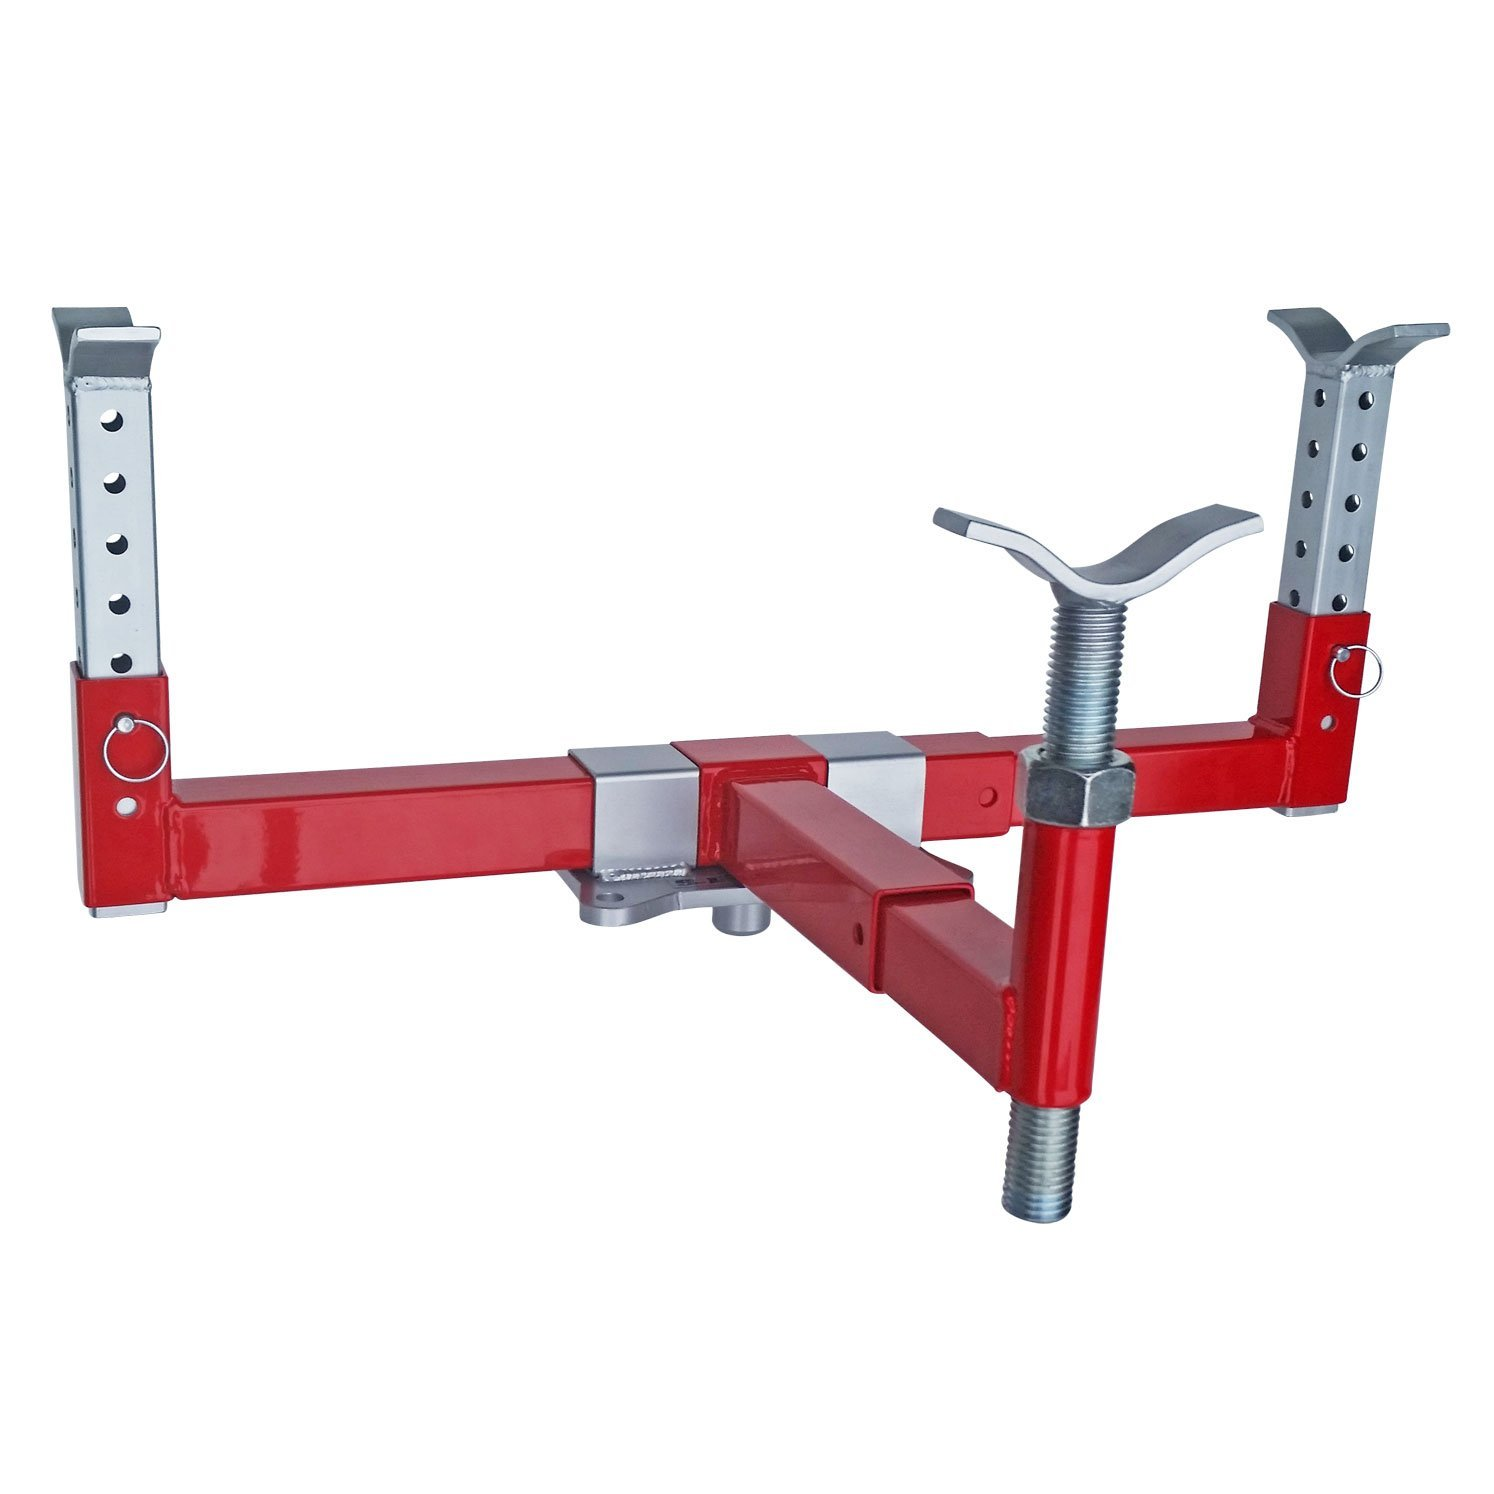 quick improvement automotive floor with jack amazon steel duty com profile pump rapid pittsburgh heavy ton lift low ultra home dp jacks